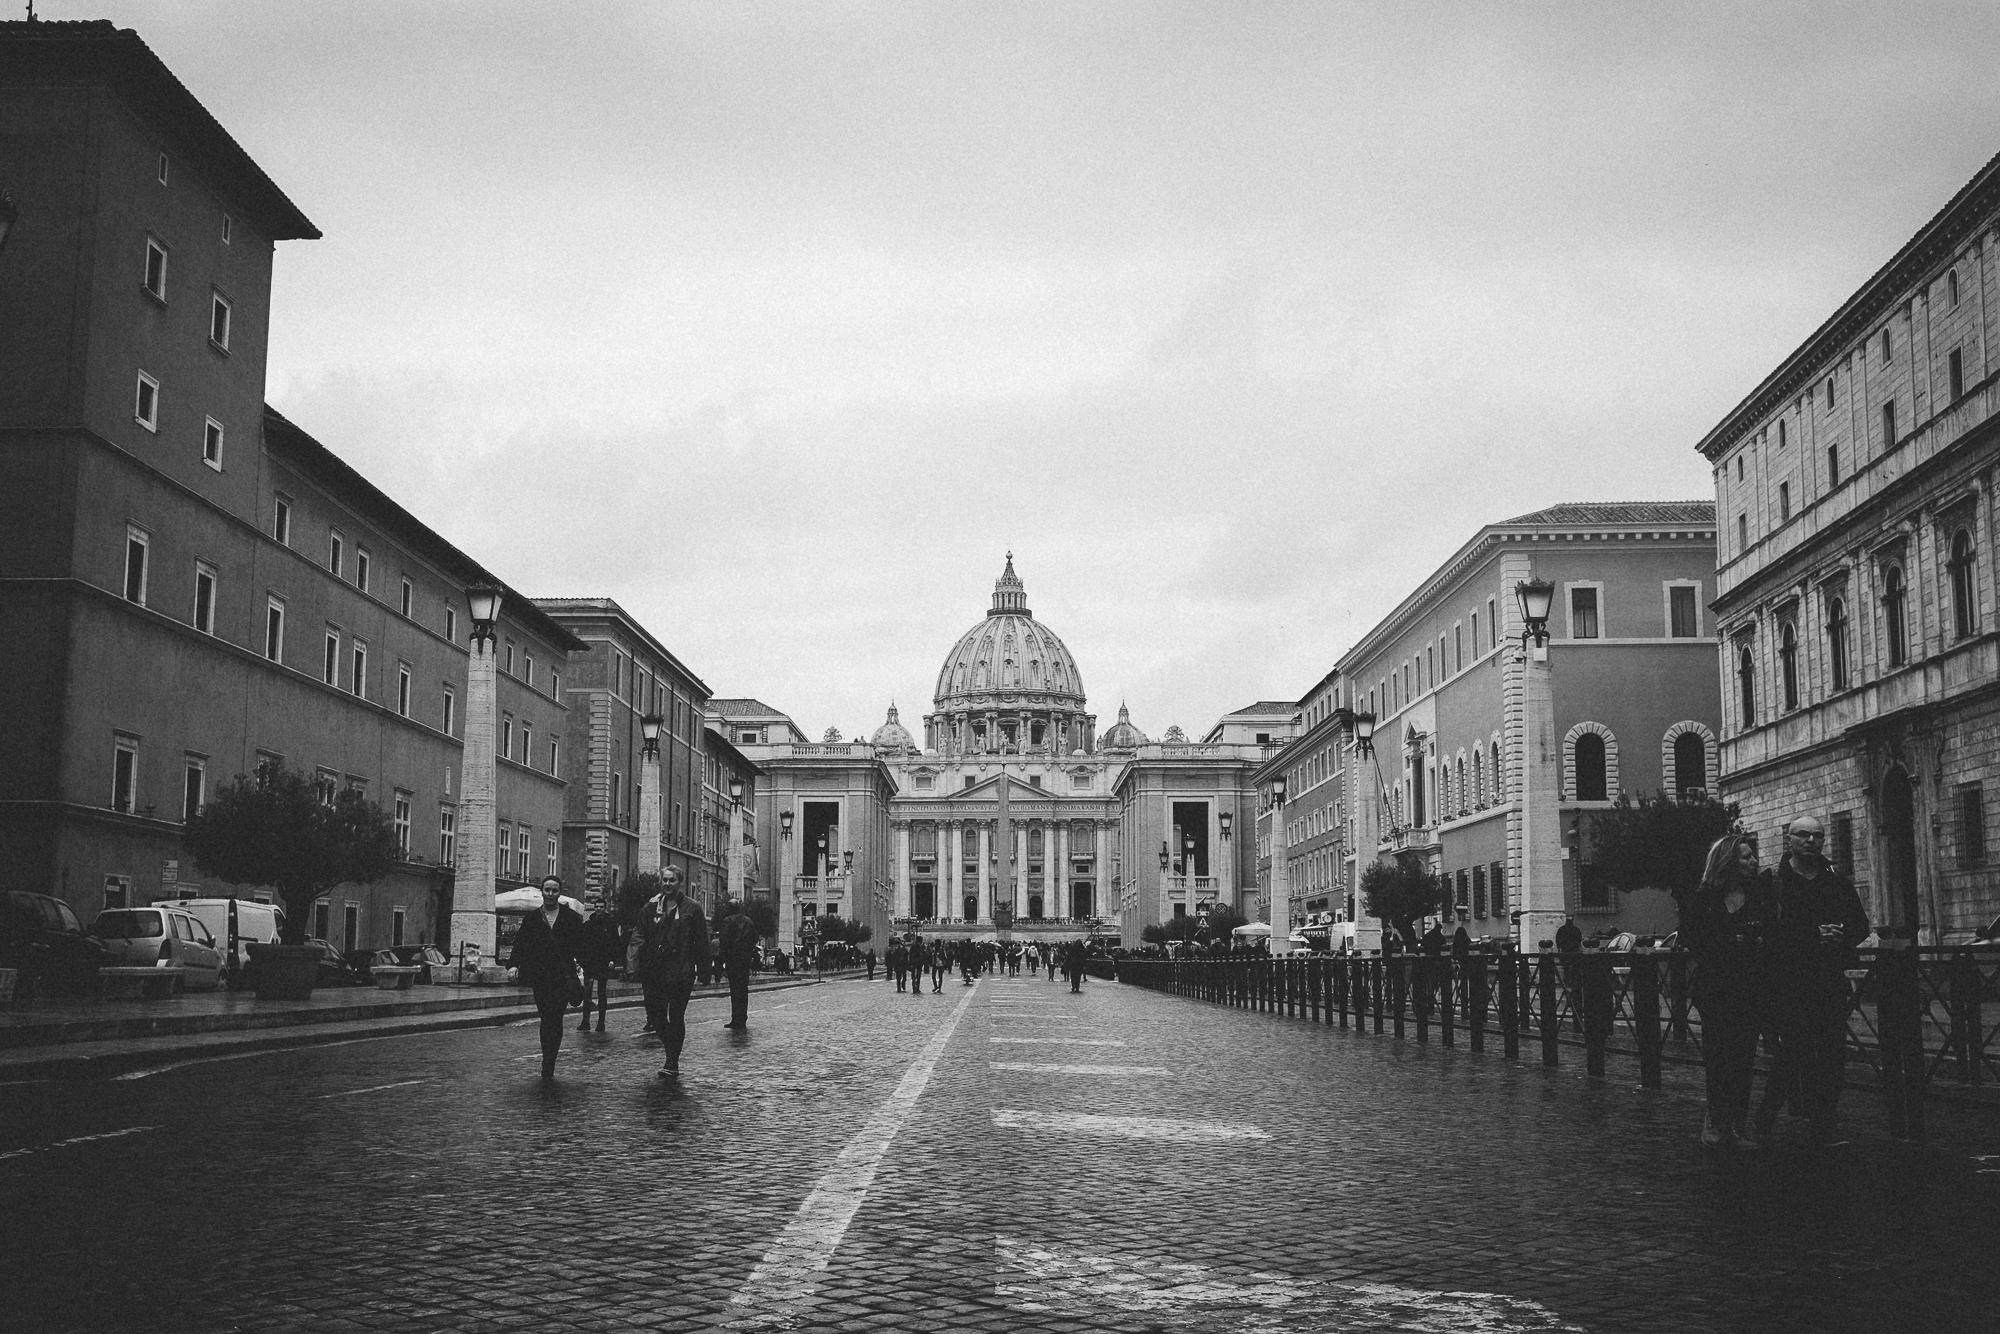 travel-photography-rome-italy-20170204-DSCF0063.jpg